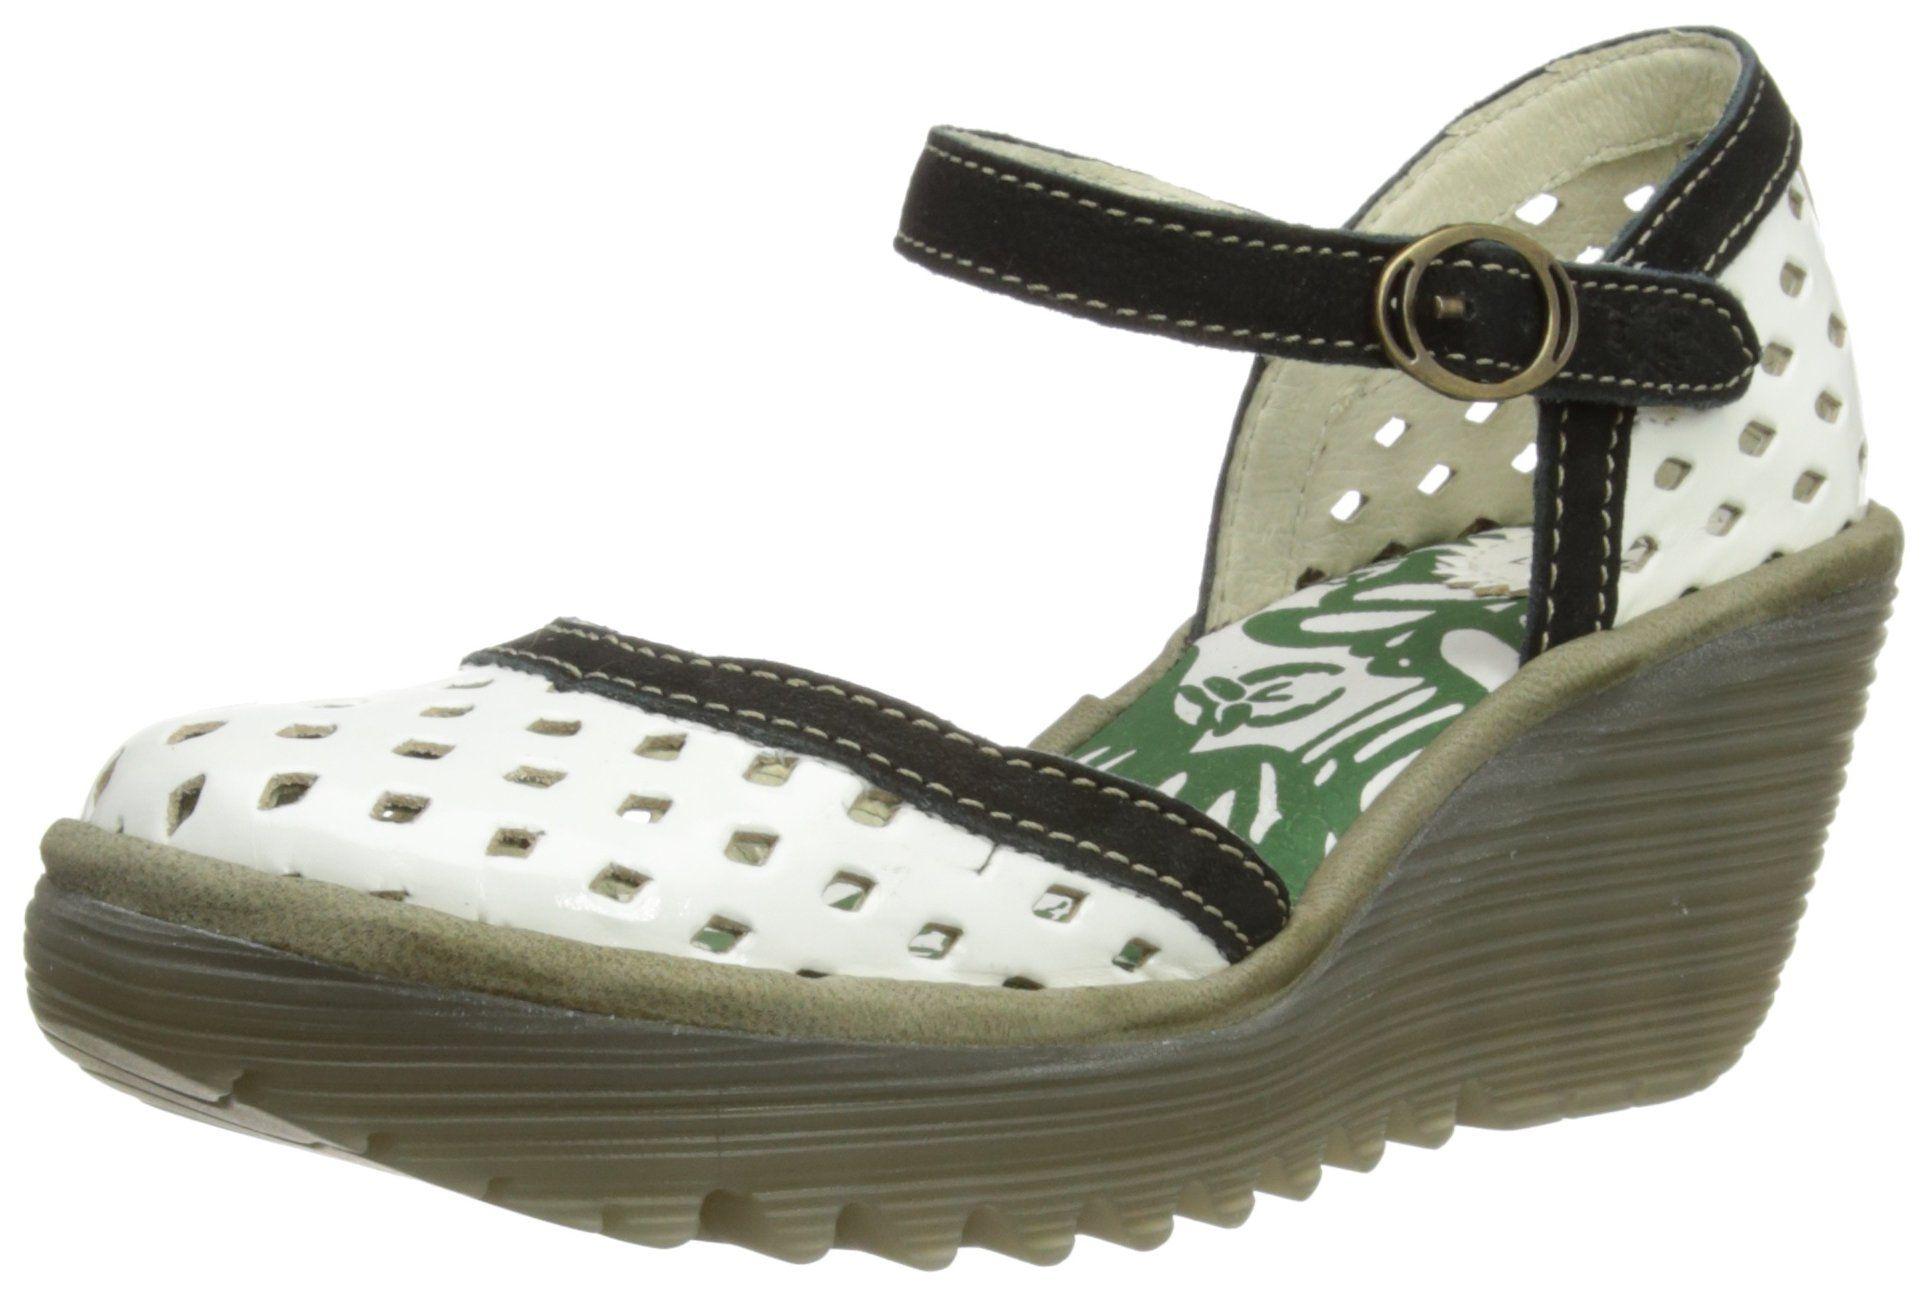 935f1d988e23b Fly London Women's Yana Perf Fashion Sandals: Amazon.co.uk: Shoes ...